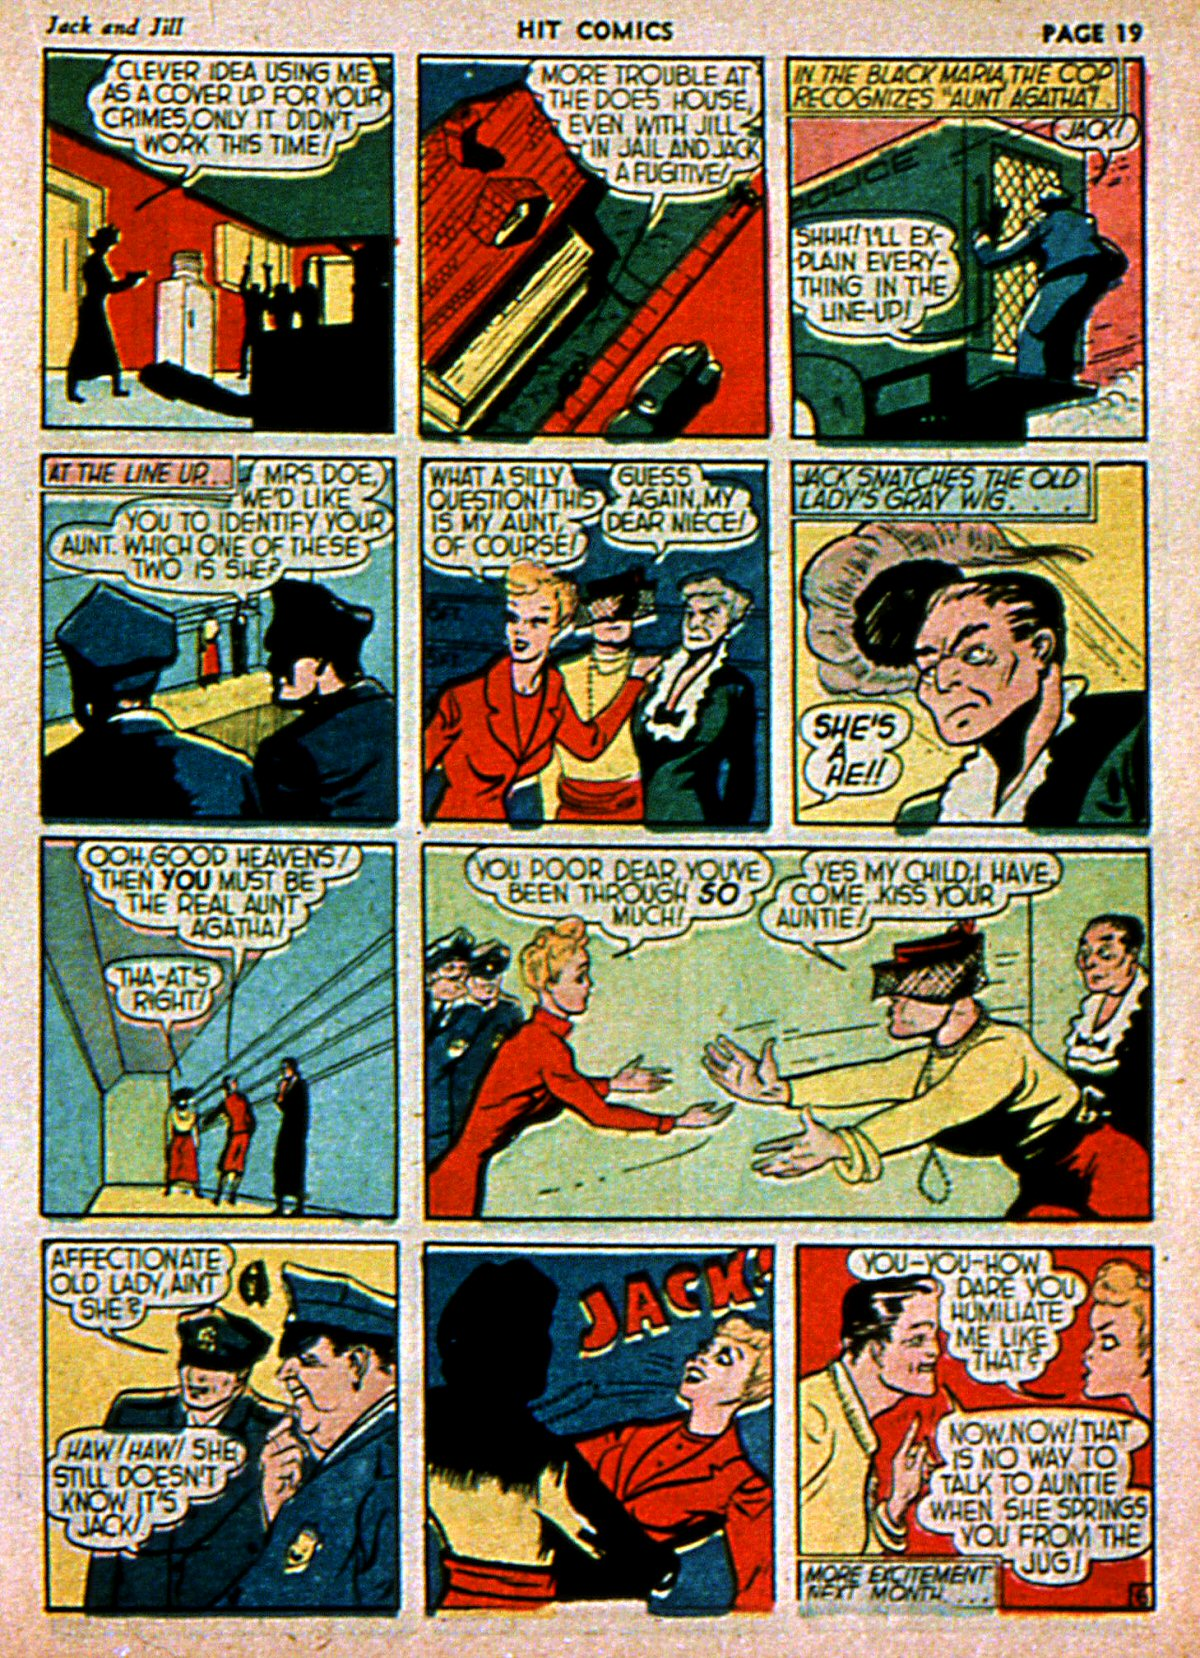 Read online Hit Comics comic -  Issue #3 - 21